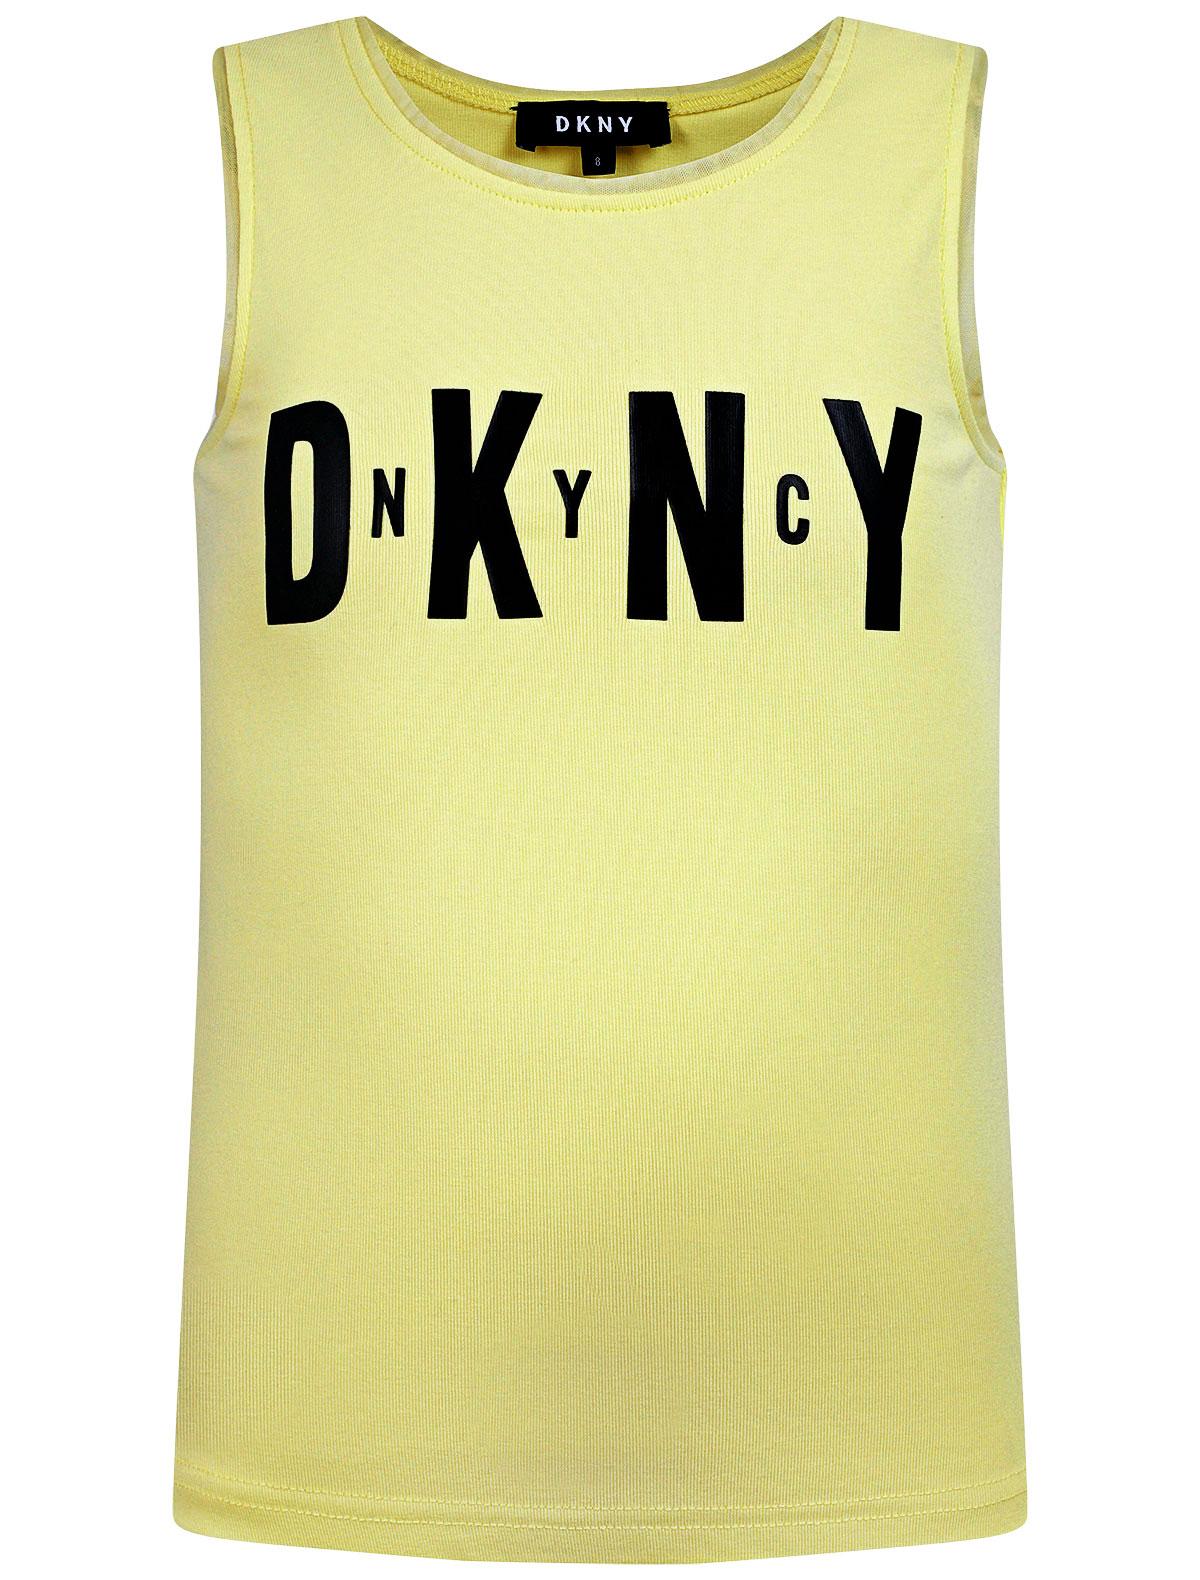 Купить 2310173, Топ DKNY, желтый, Женский, 0514509171401